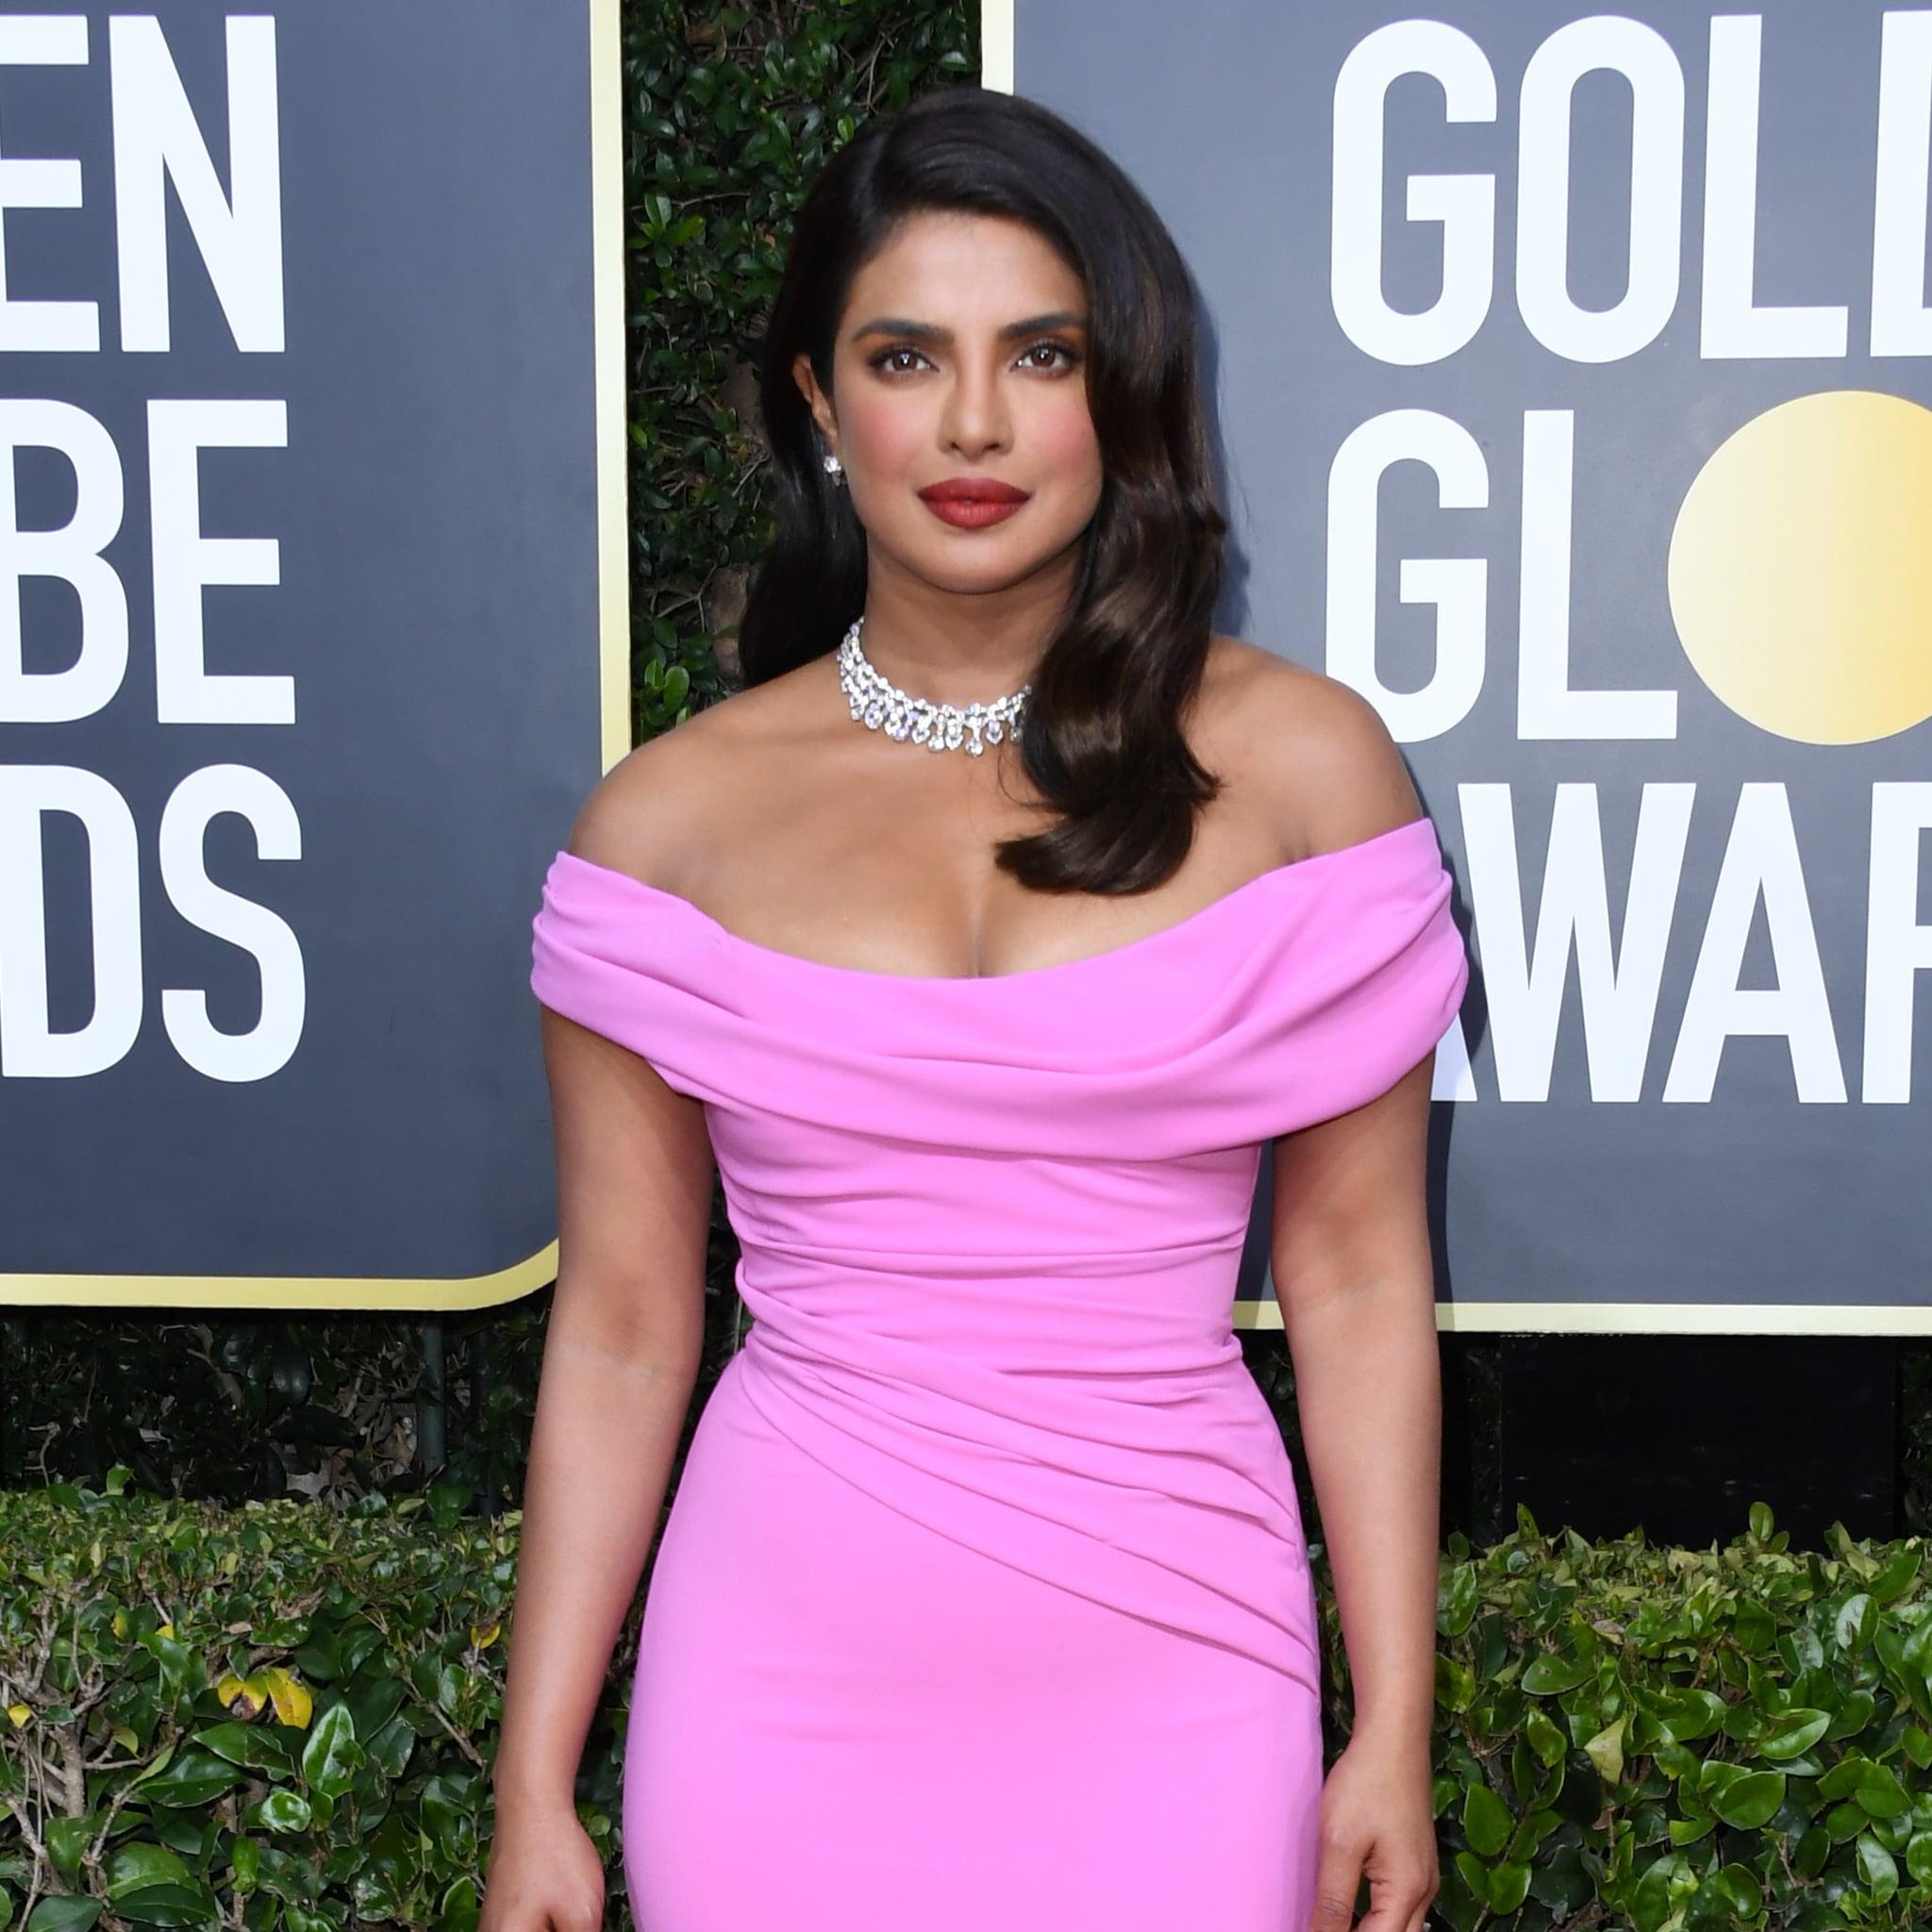 See Priyanka Chopra's Glam Pink Dress at the Golden Globes   POPSUGAR Fashion